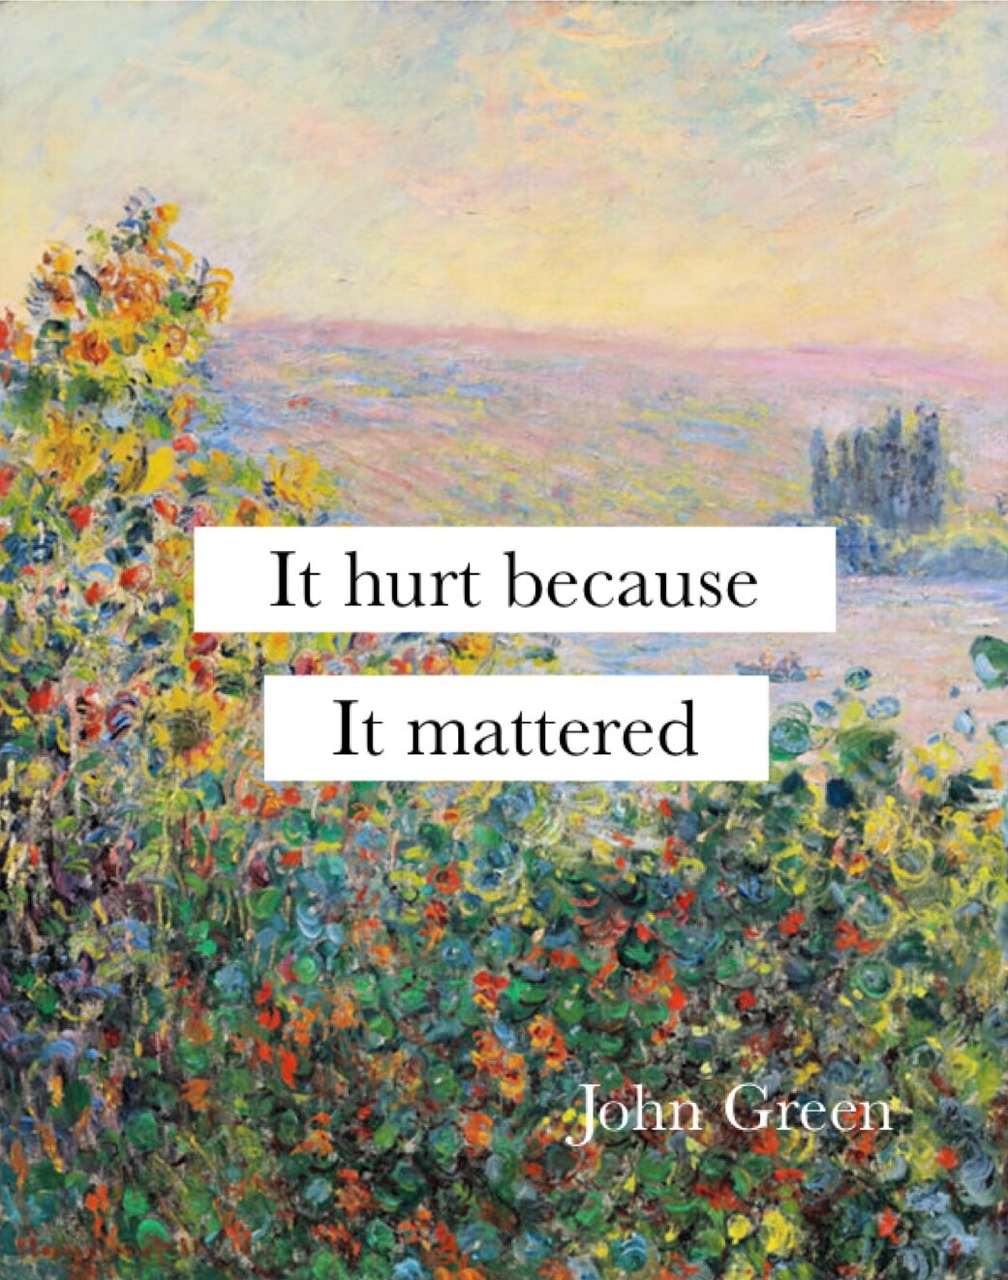 john green, life, and words image